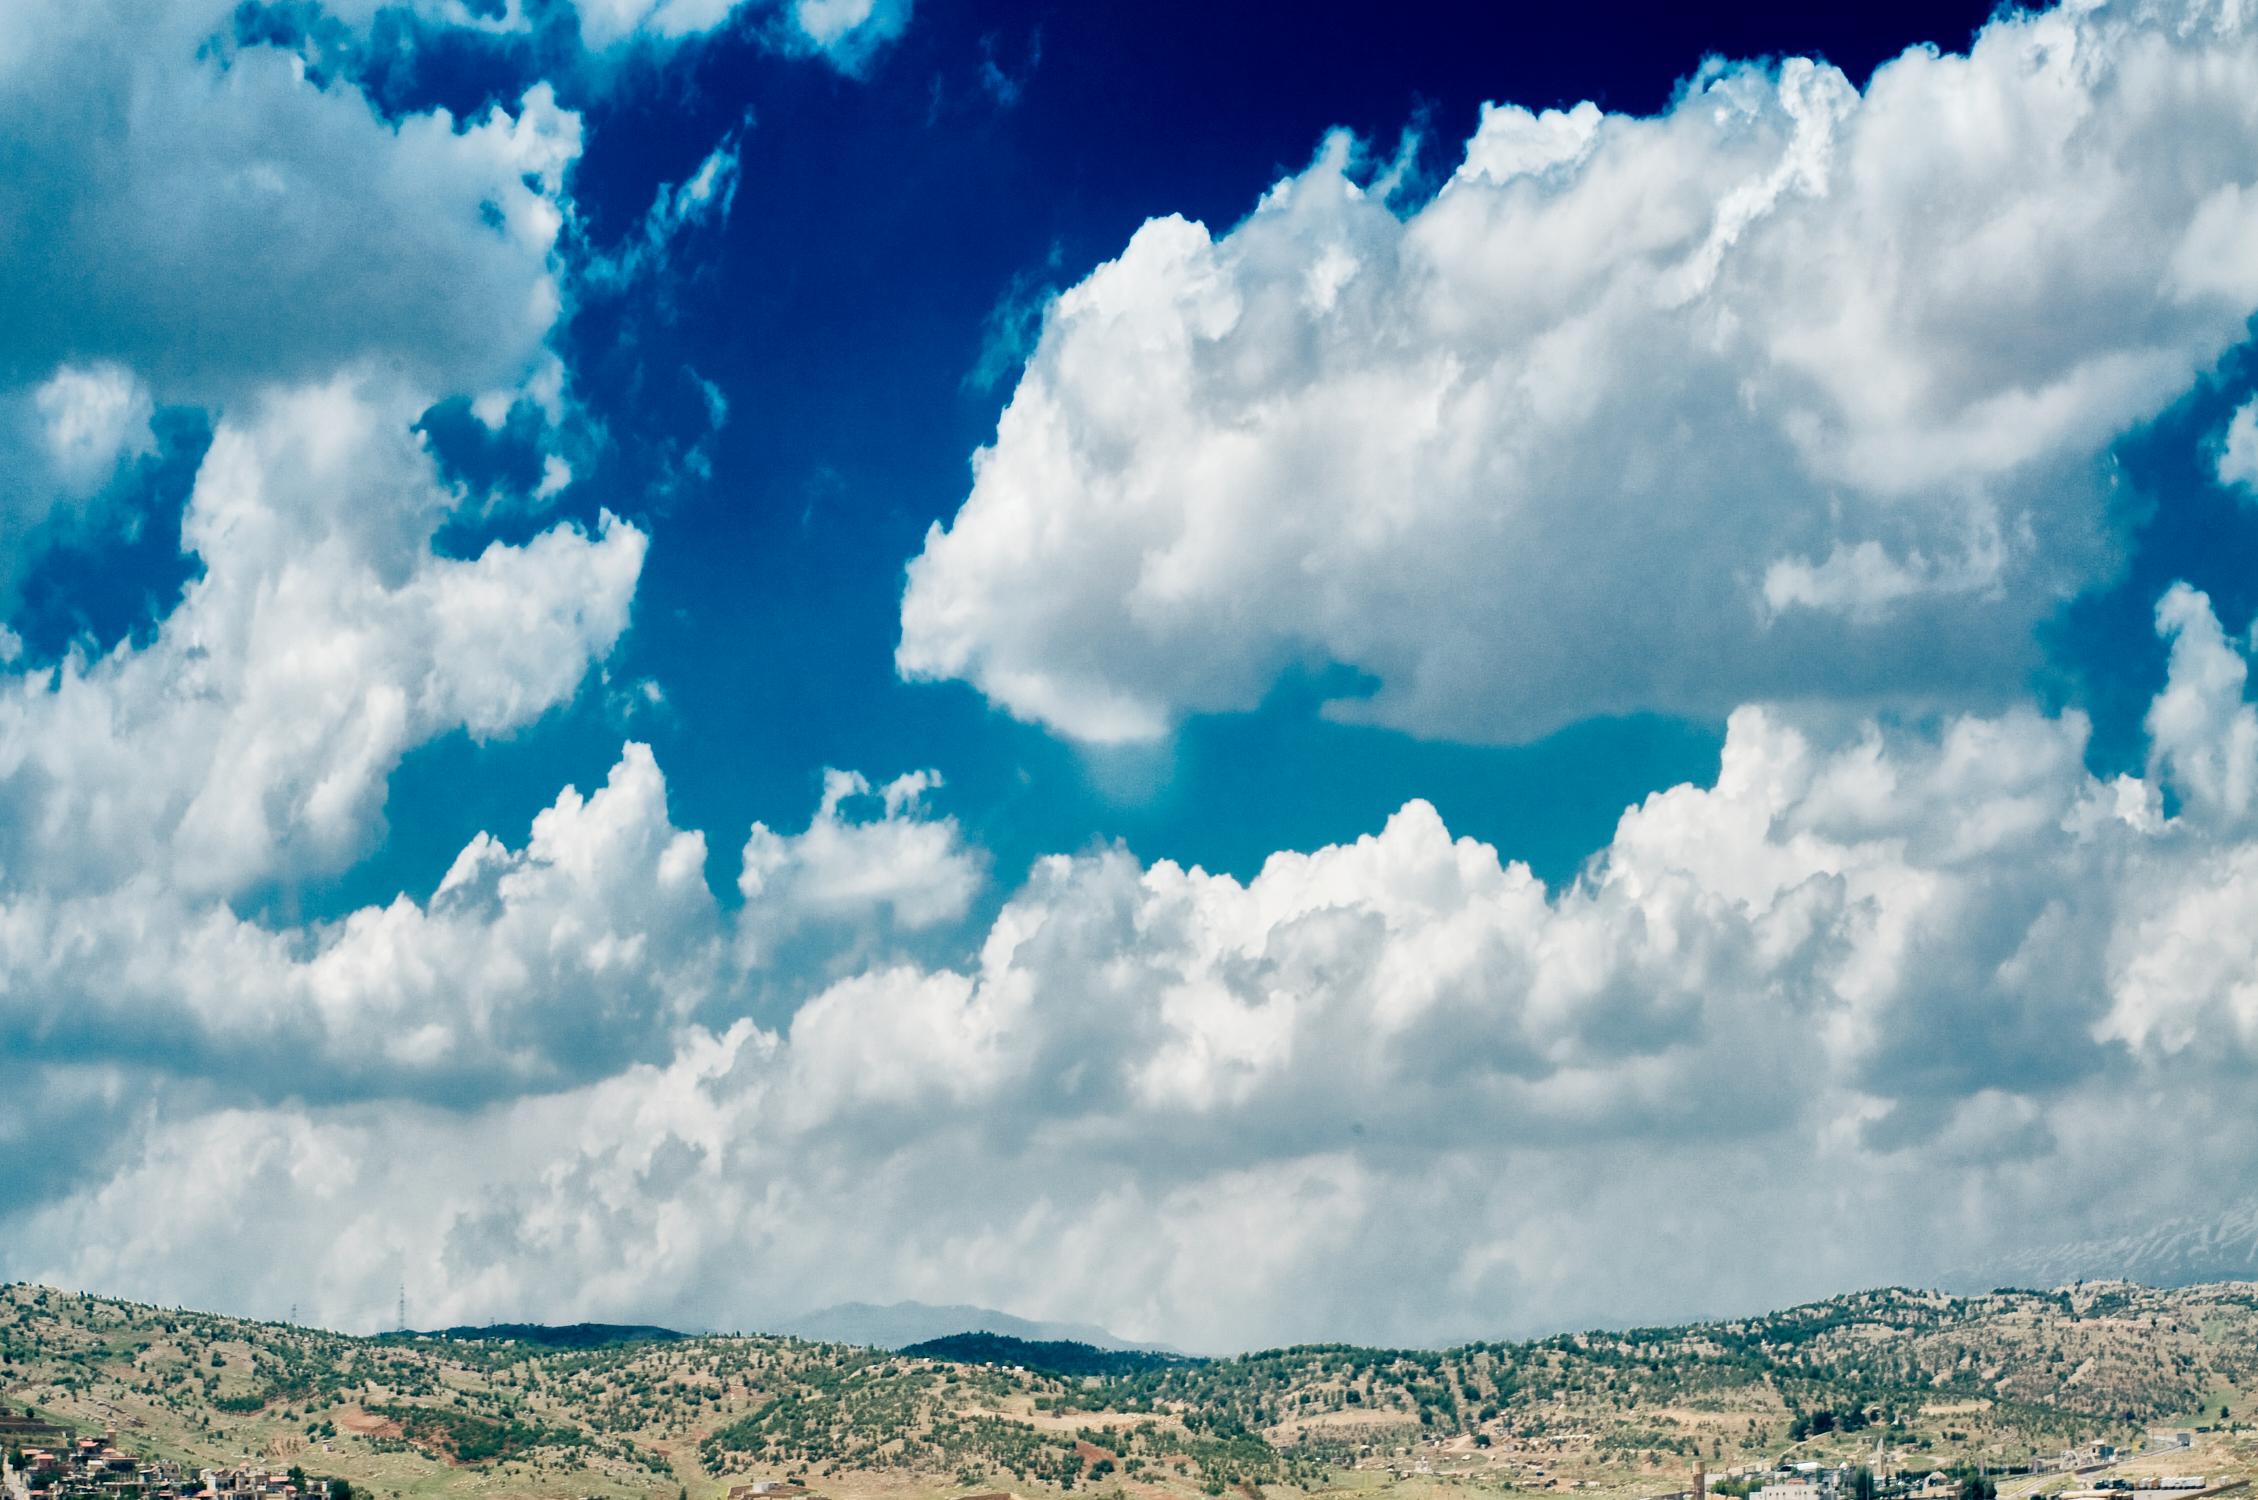 duncantelford_syria_clouds.jpg